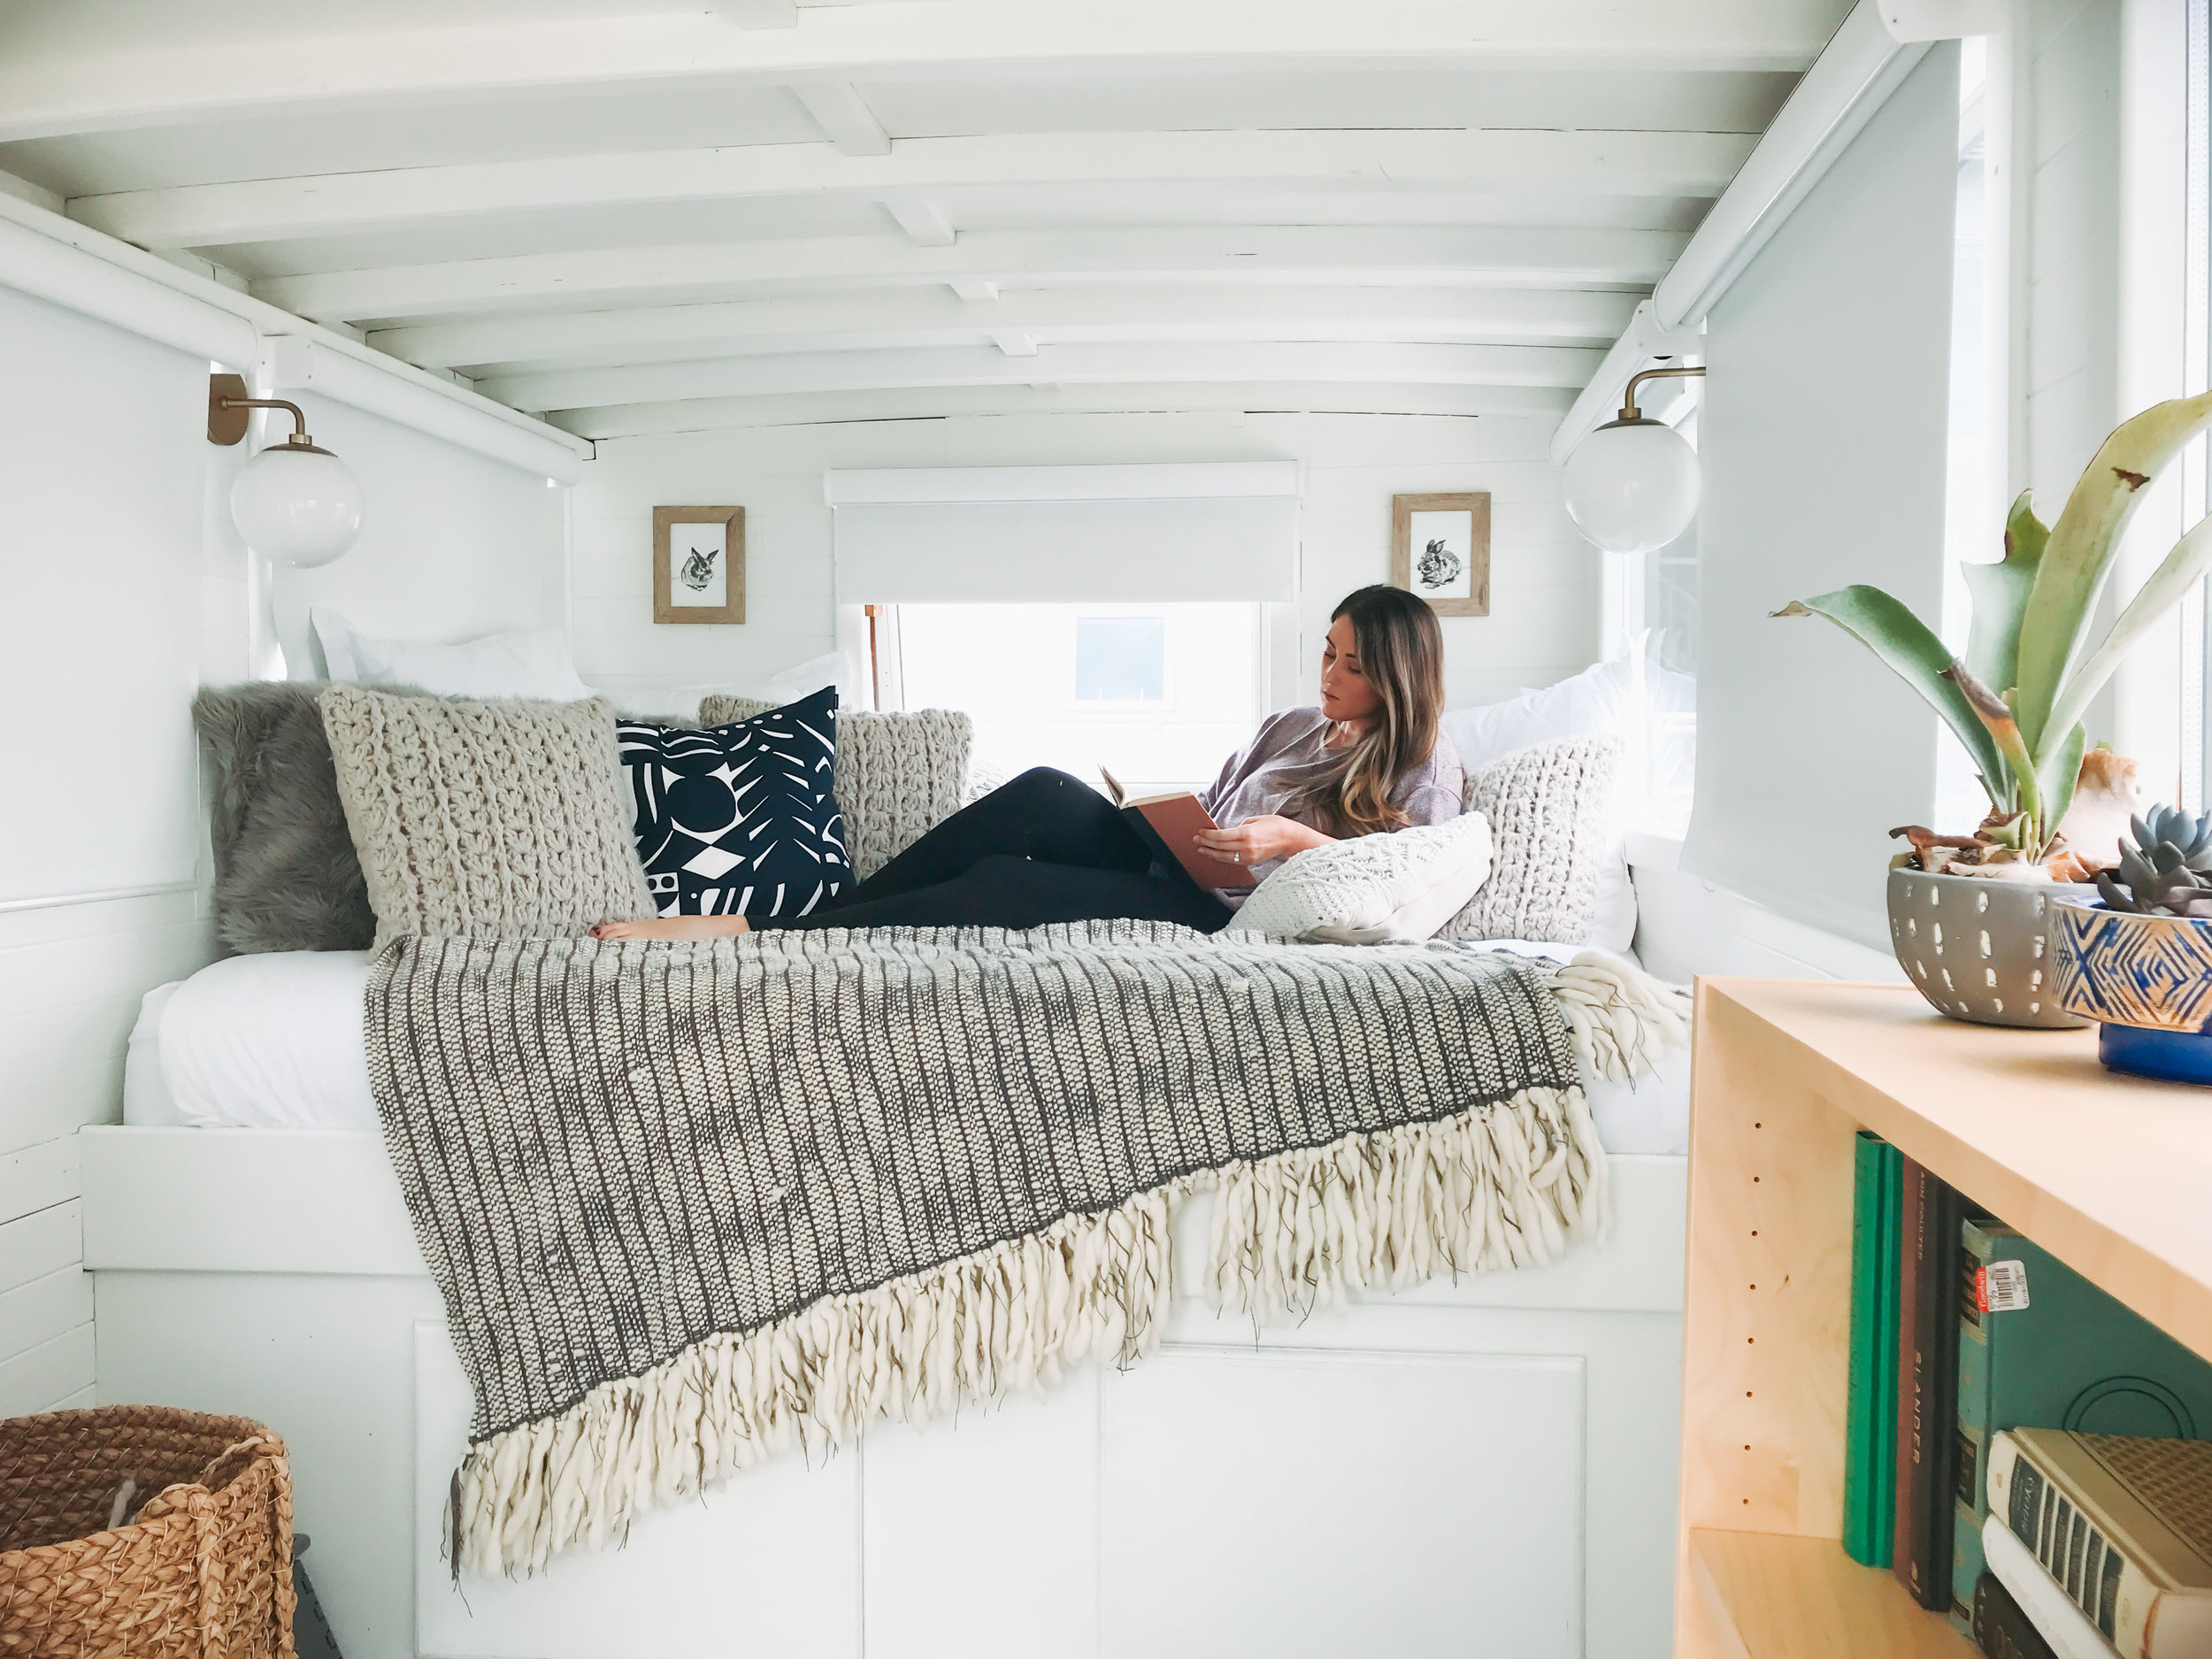 katherine_mendieta_seattle_lakeside_lovenest_houseboat.jpg